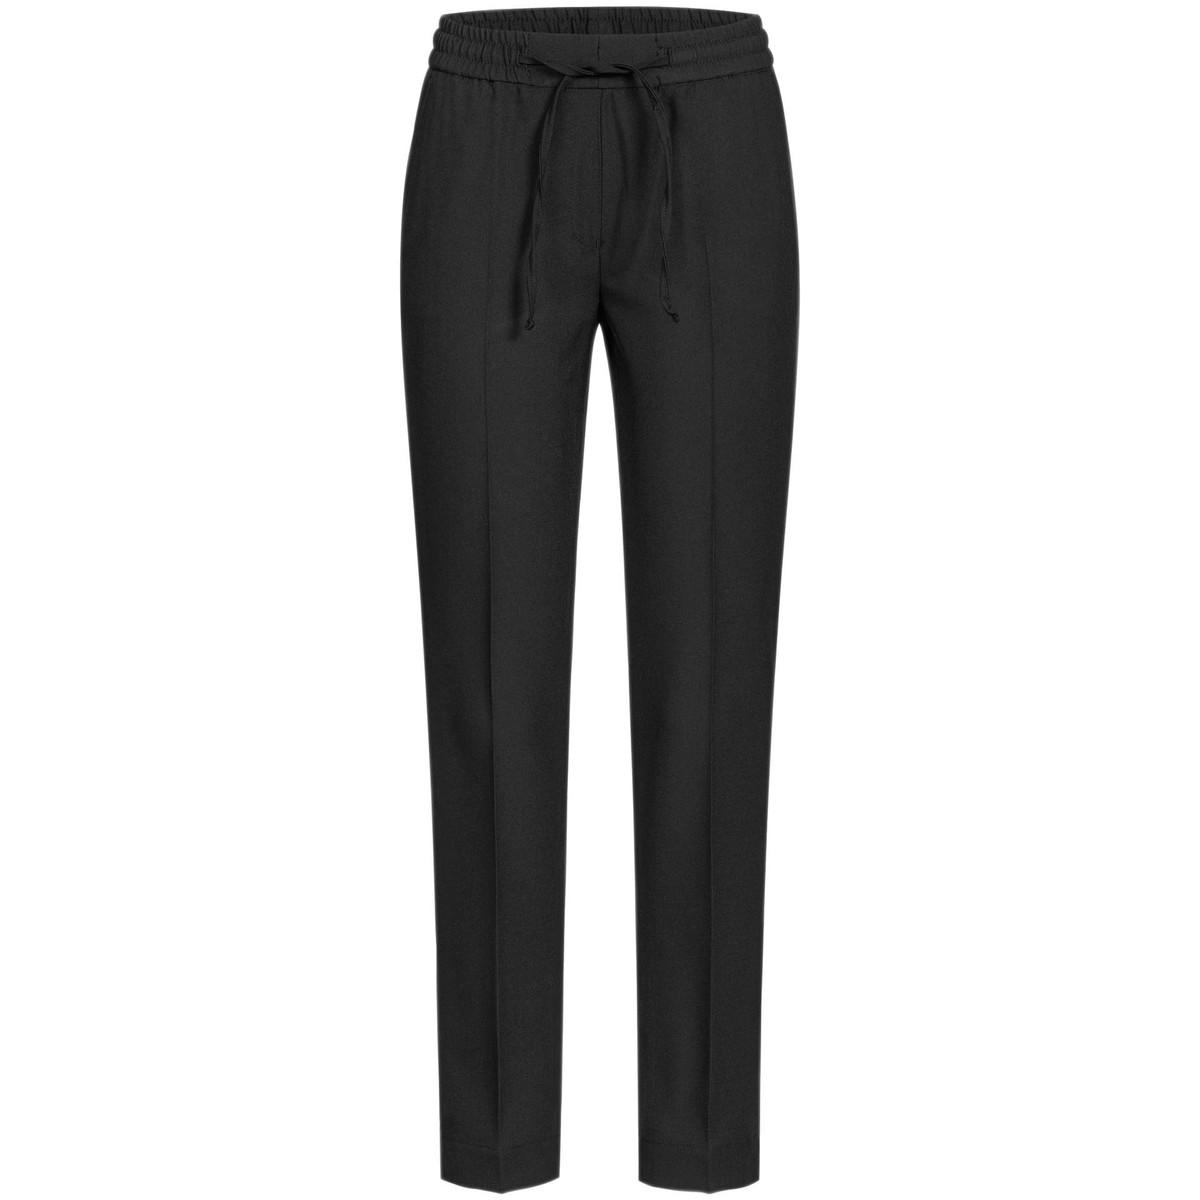 "Damen-Hose ""Joggpants"" schwarz Größe 40"